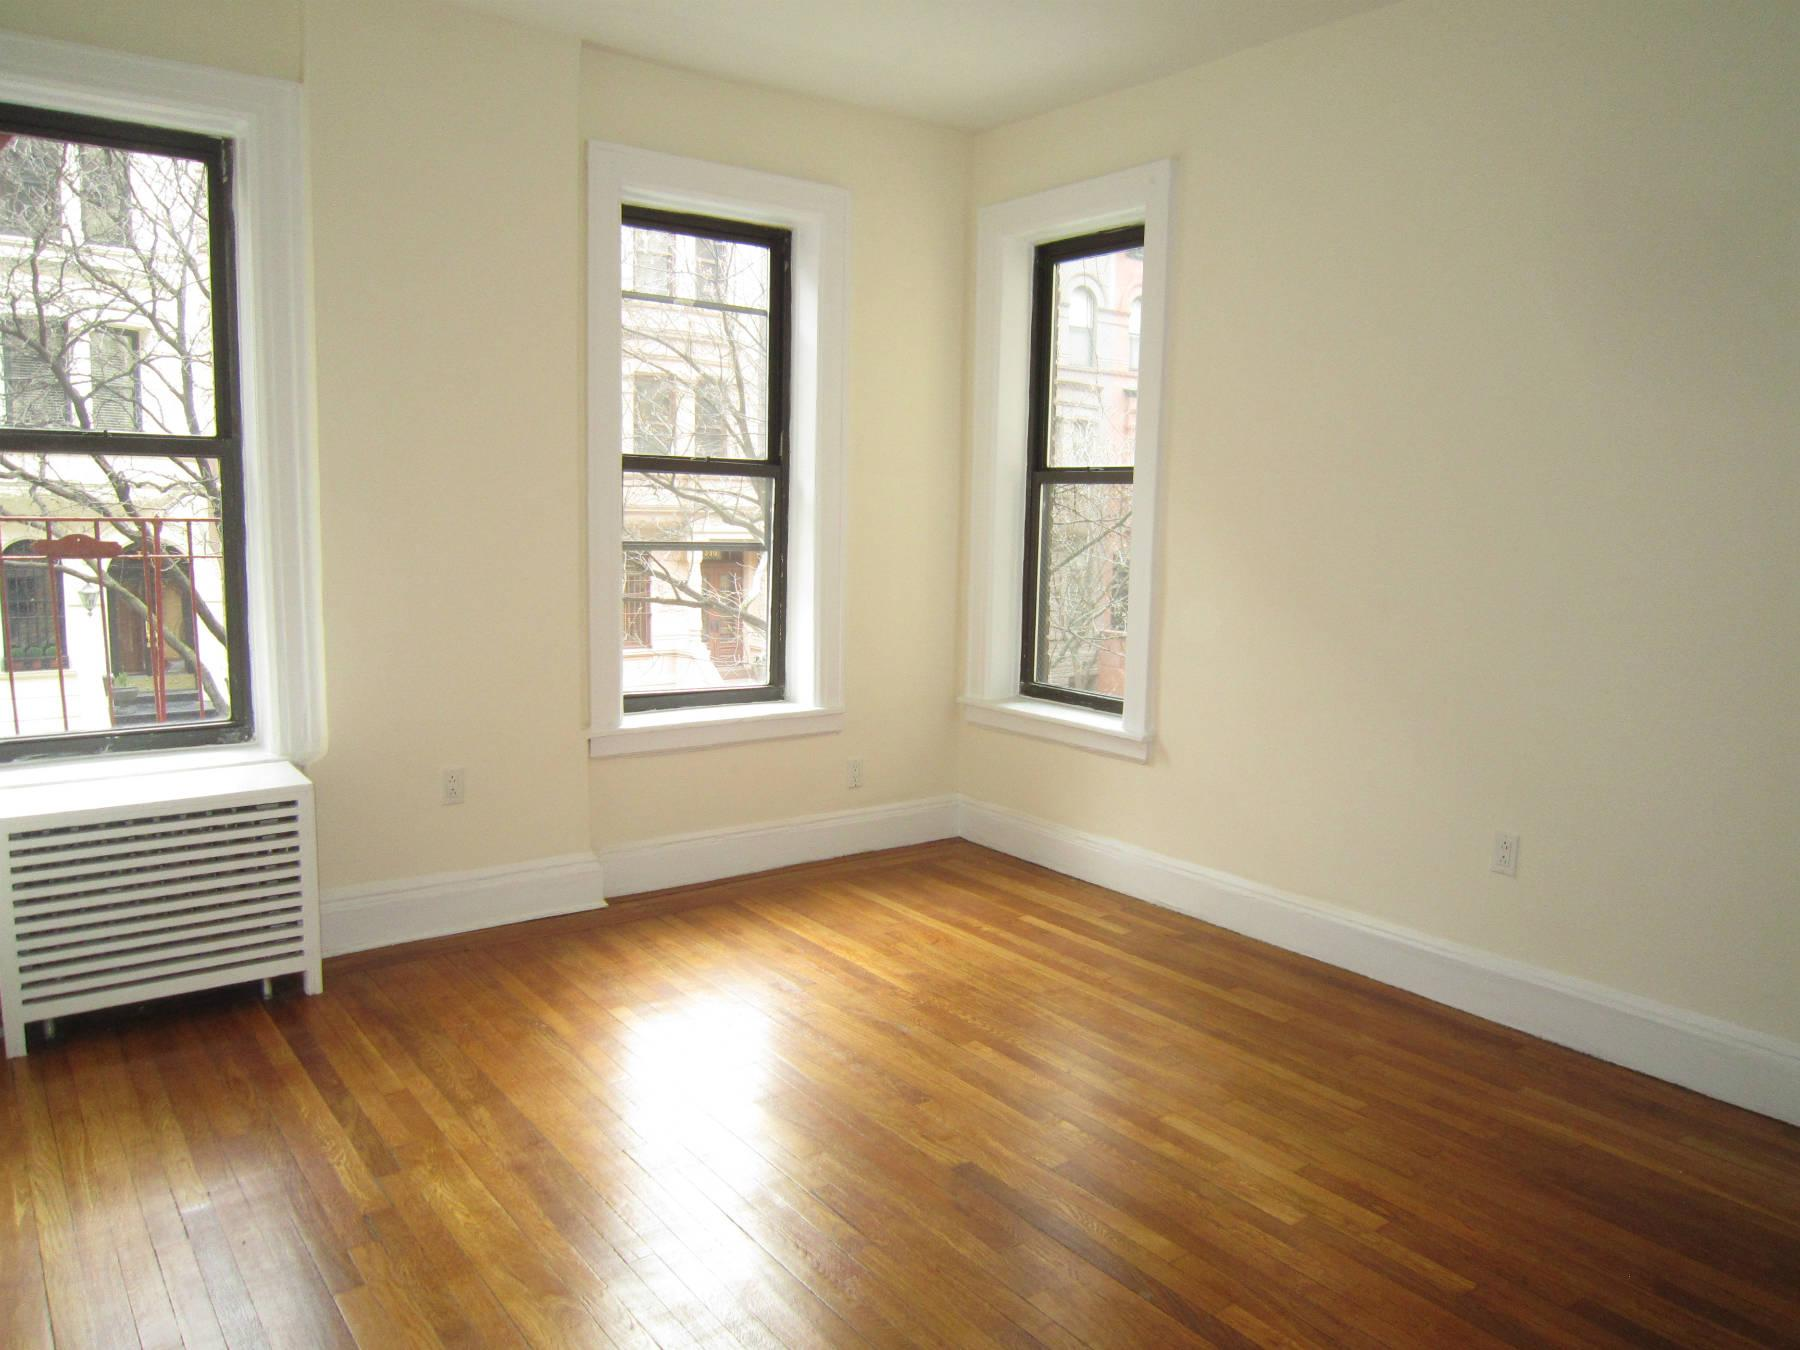 325 W 71st Street, Apt 2D, Manhattan, New York 10023